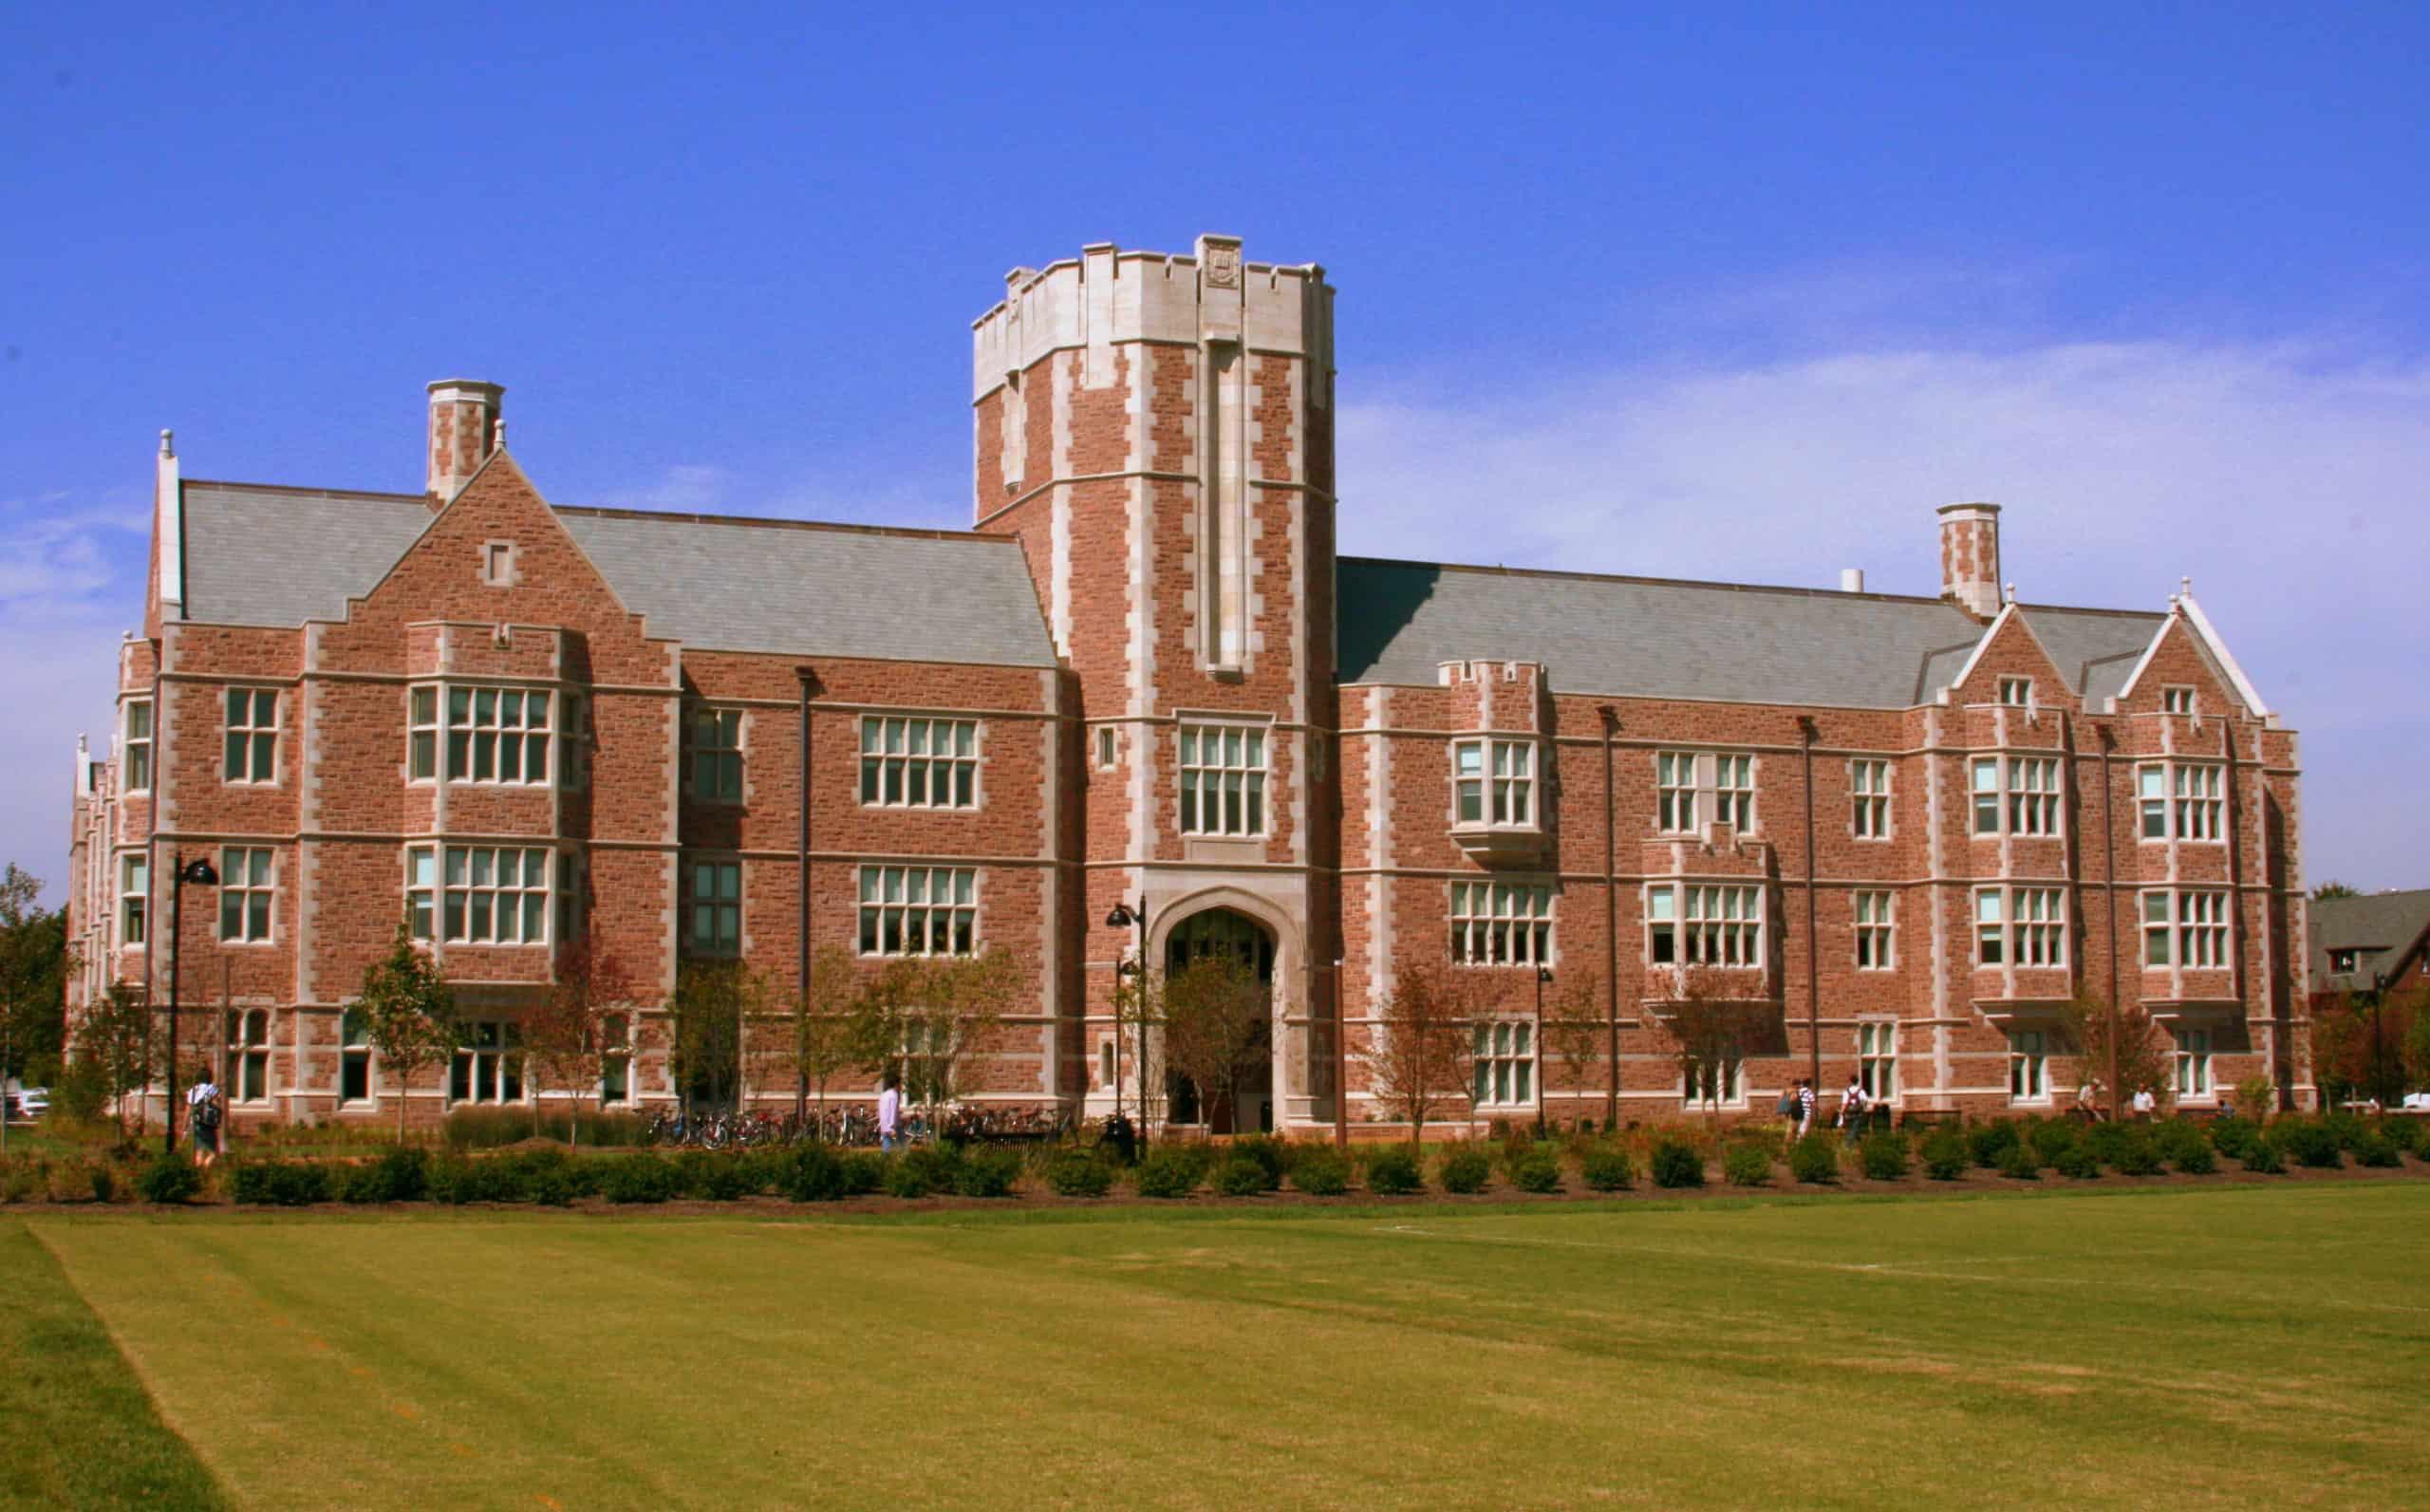 Best_Accredited_Online_Law_Schools_Washington_University_St. Louis